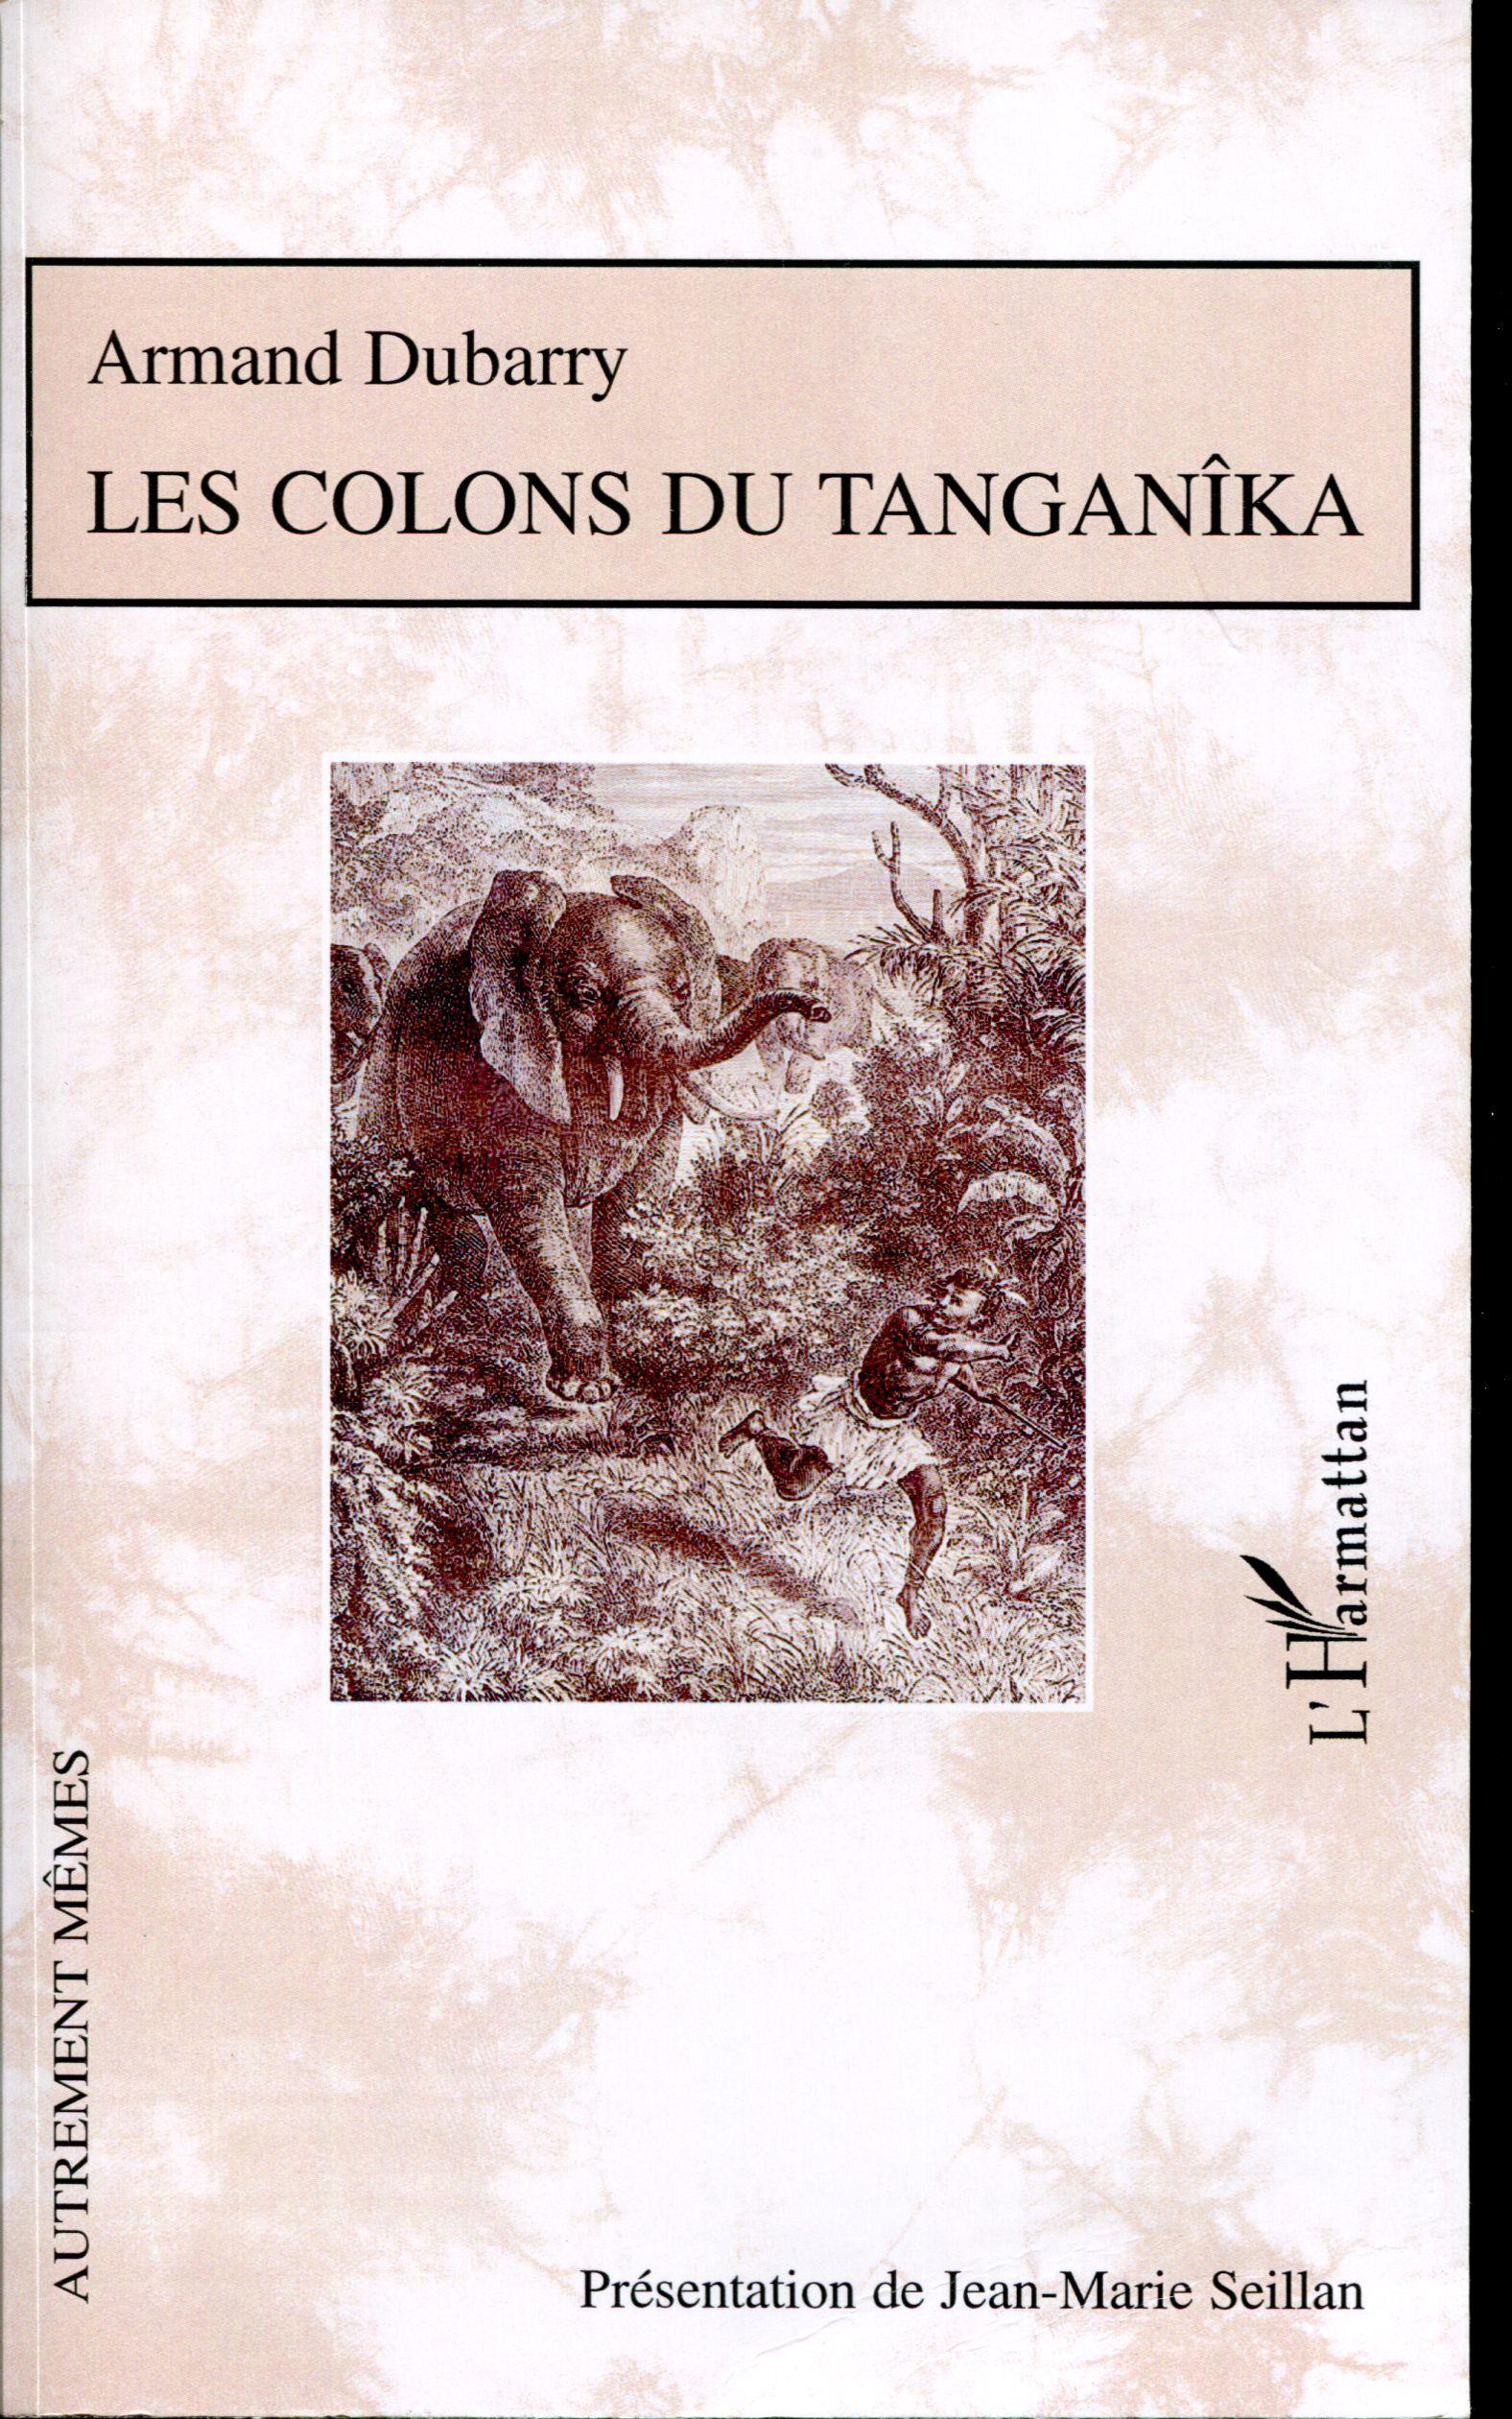 Les colons du Tanganîka